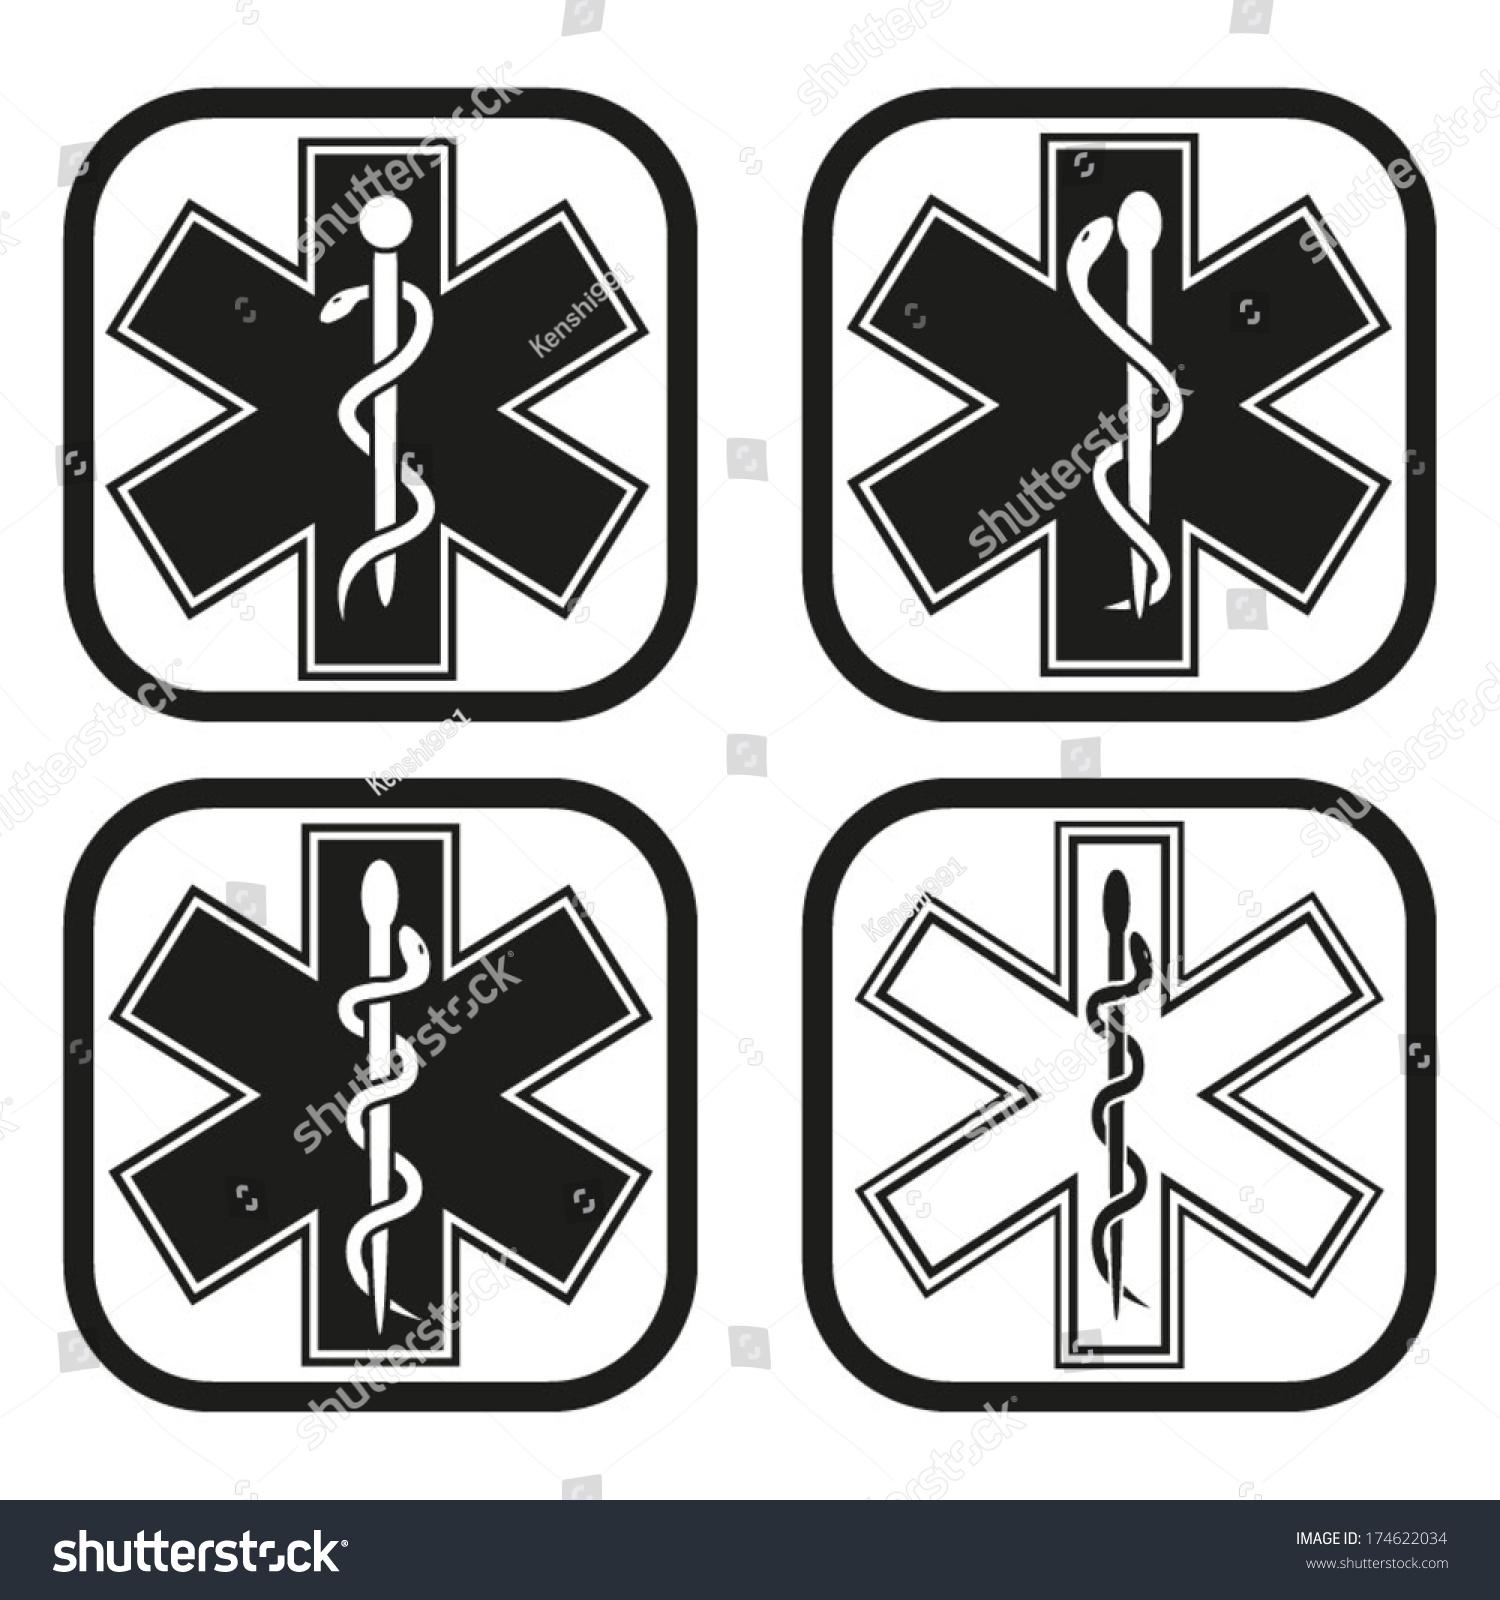 Medical Emergency Symbol Four Variations Stock Vector 174622034